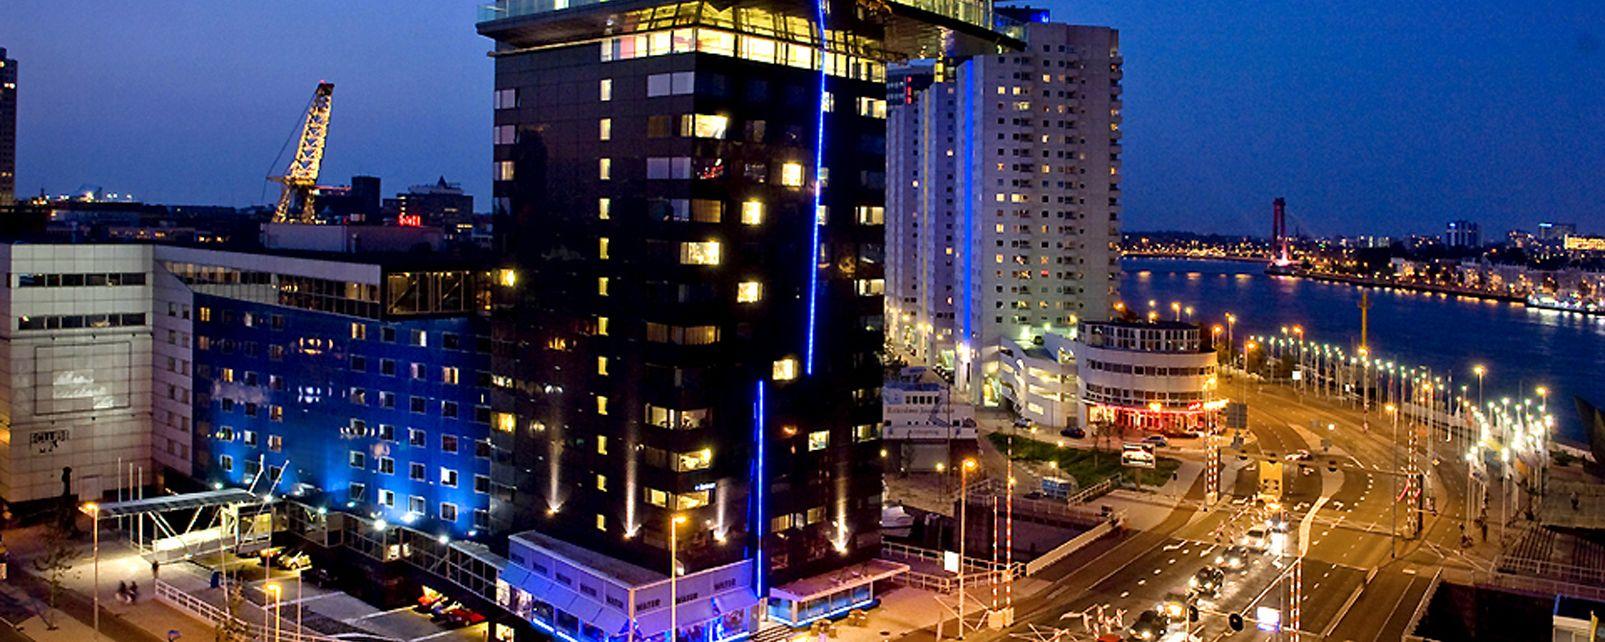 Hôtel Inntel Hotel Design